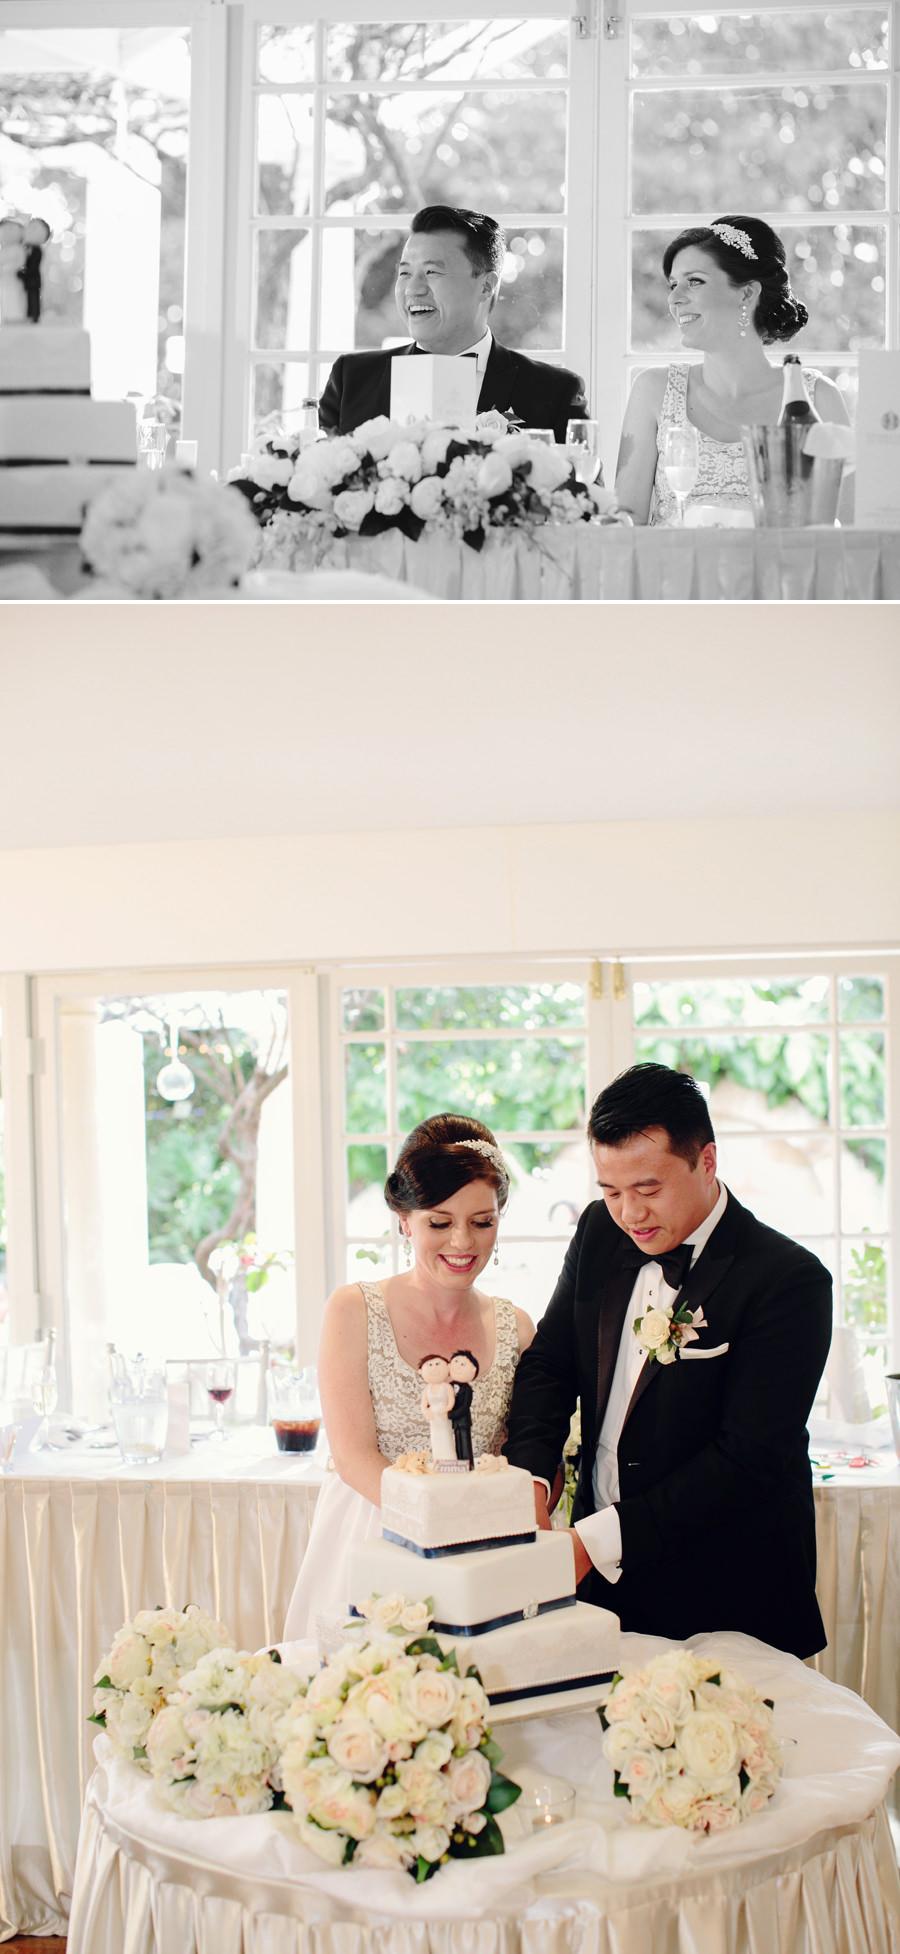 Navarra Venues Wedding Photography: Reception